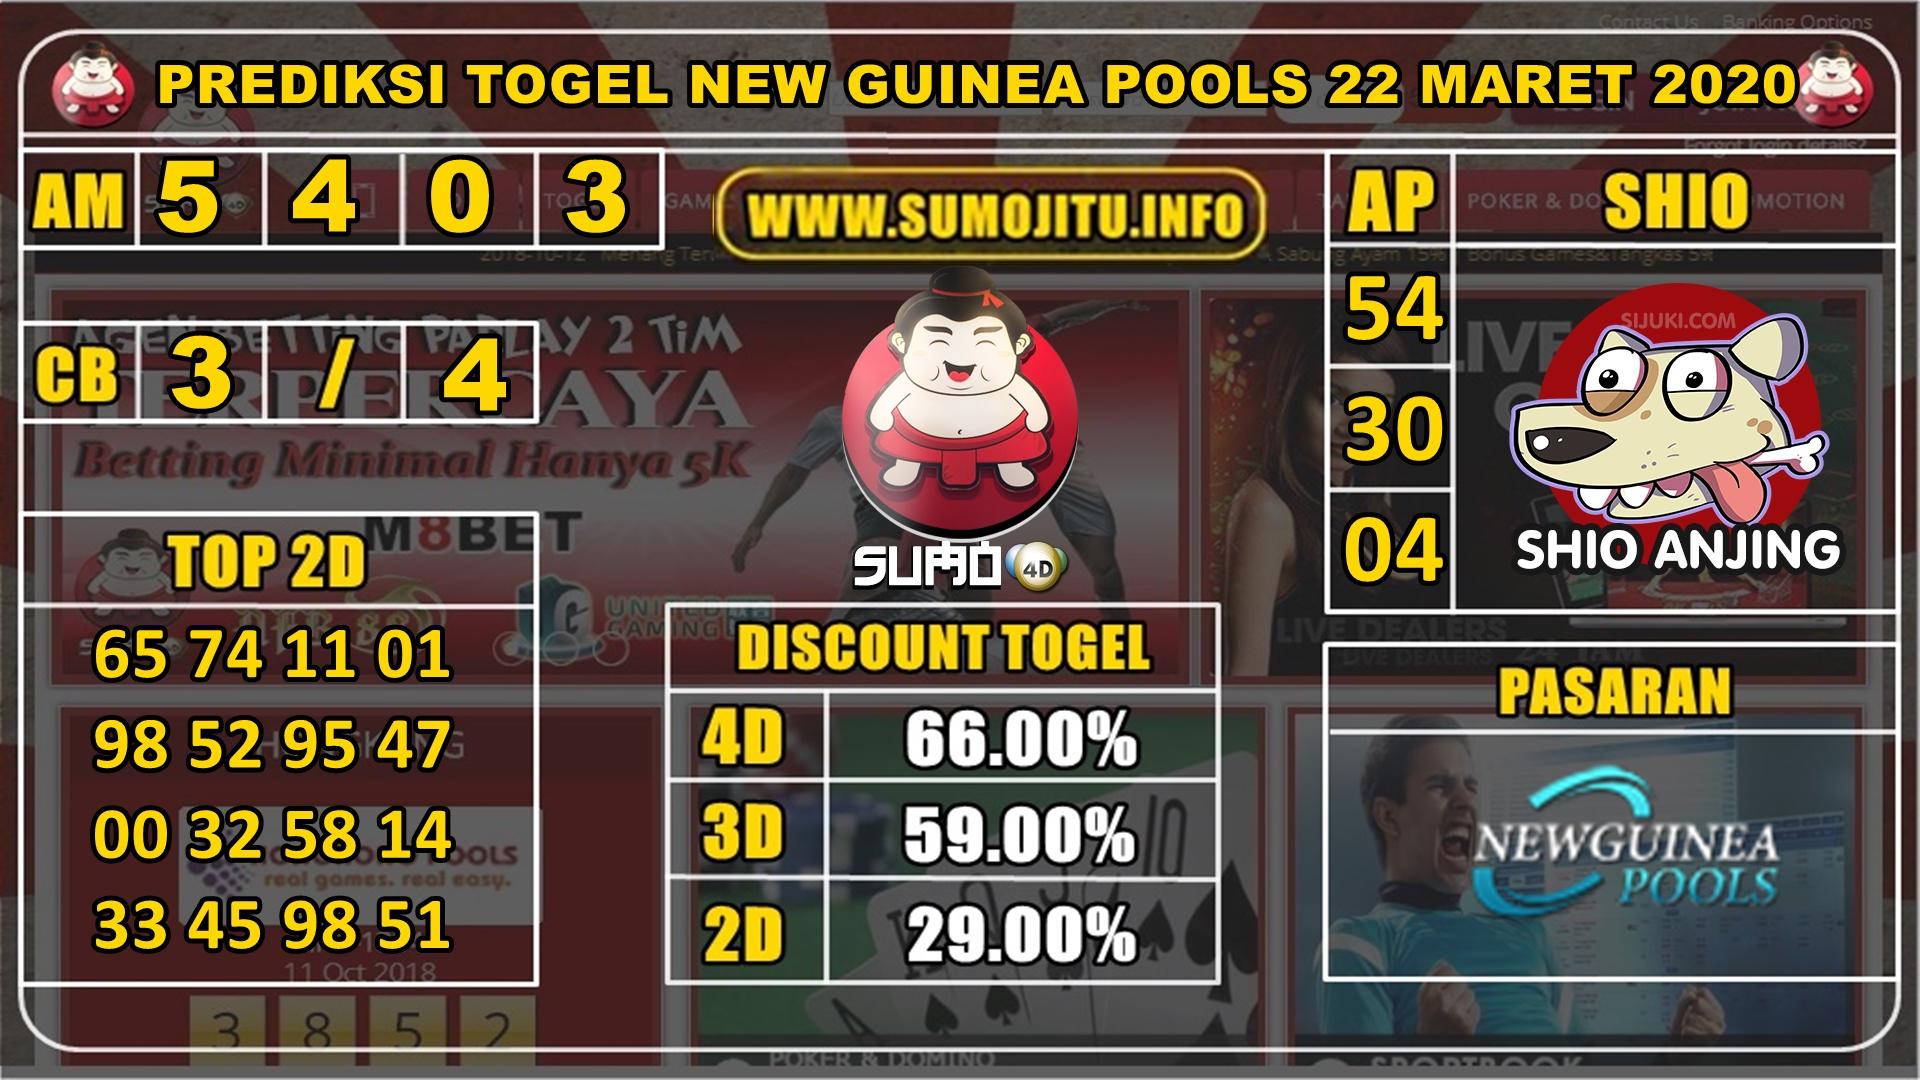 PREDIKSI NEW GUINEA POOLS 22 MARET 2020